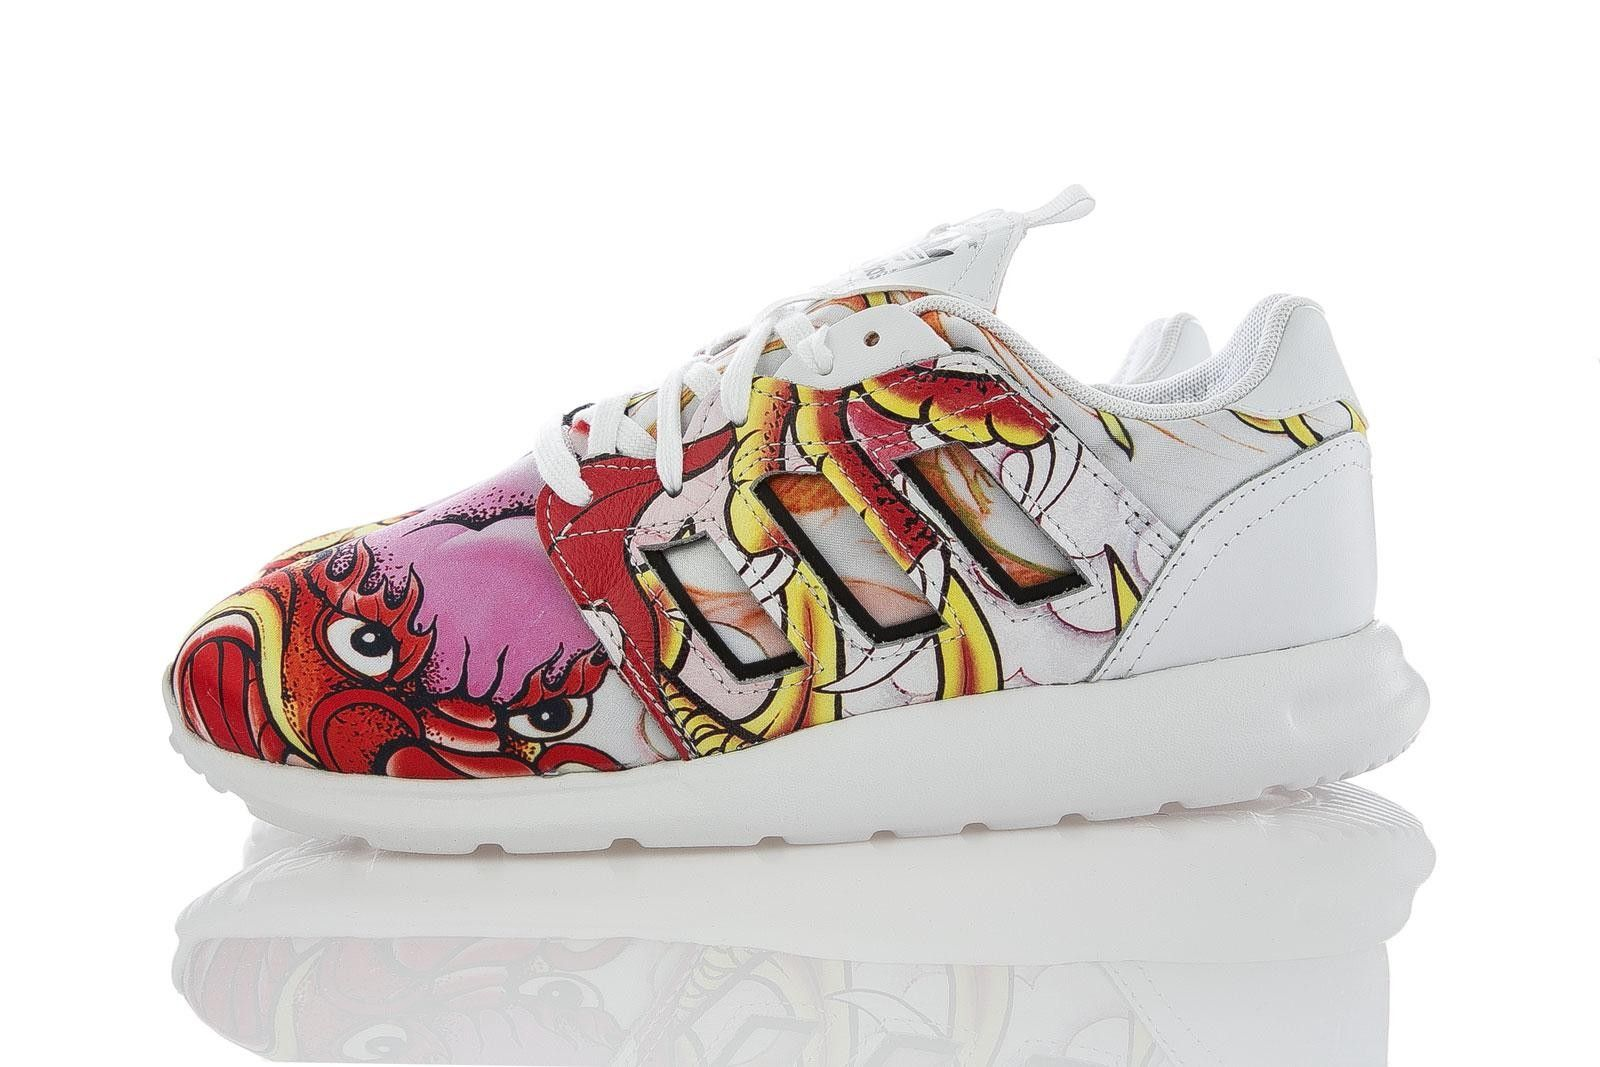 adidas rita ora dragon shoes